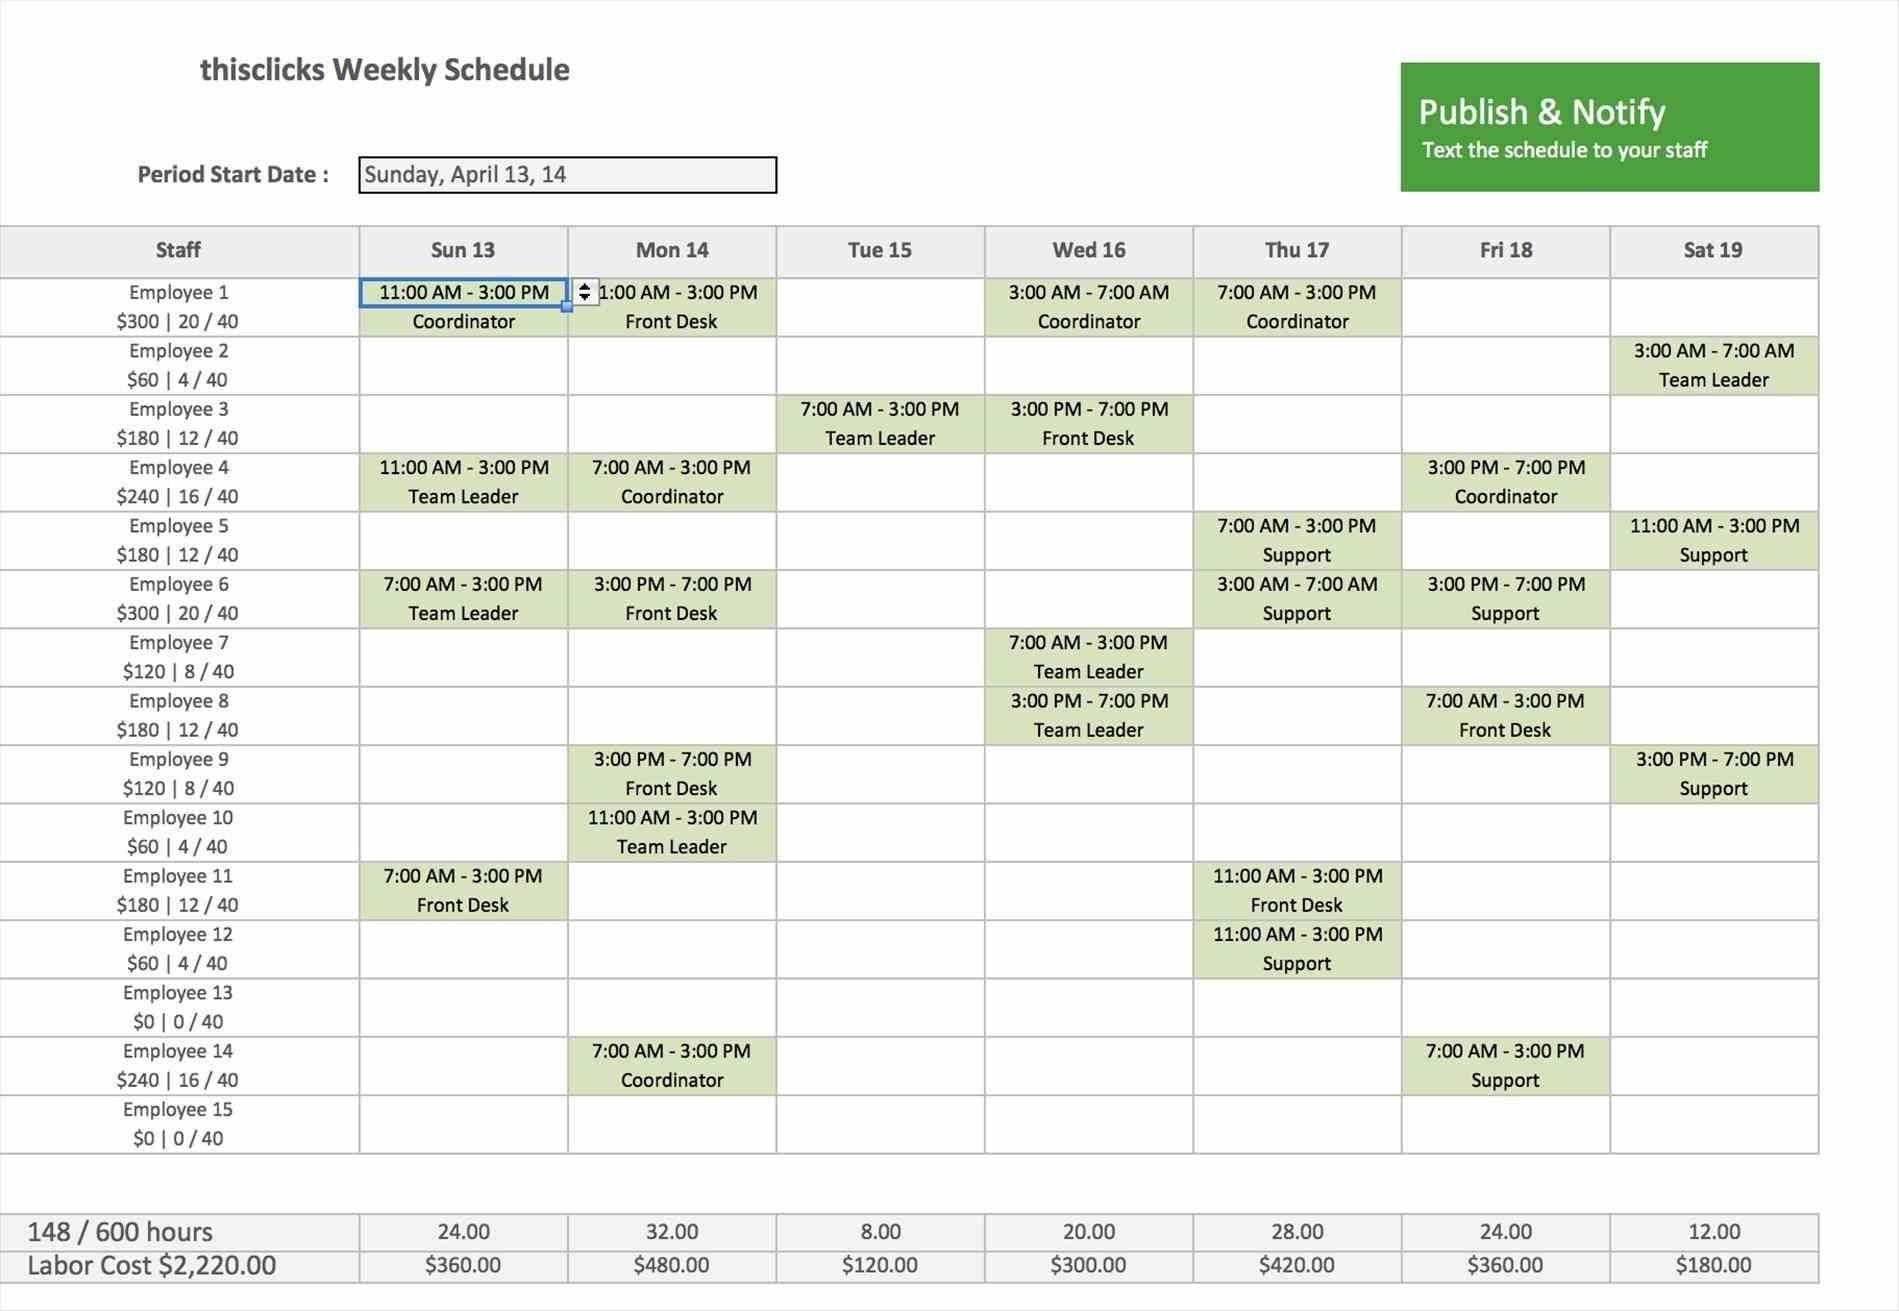 Template Excel Schedule Maker Spreadsheet Template Make Employee In With Excel Spreadsheet For Scheduling Employee Shifts